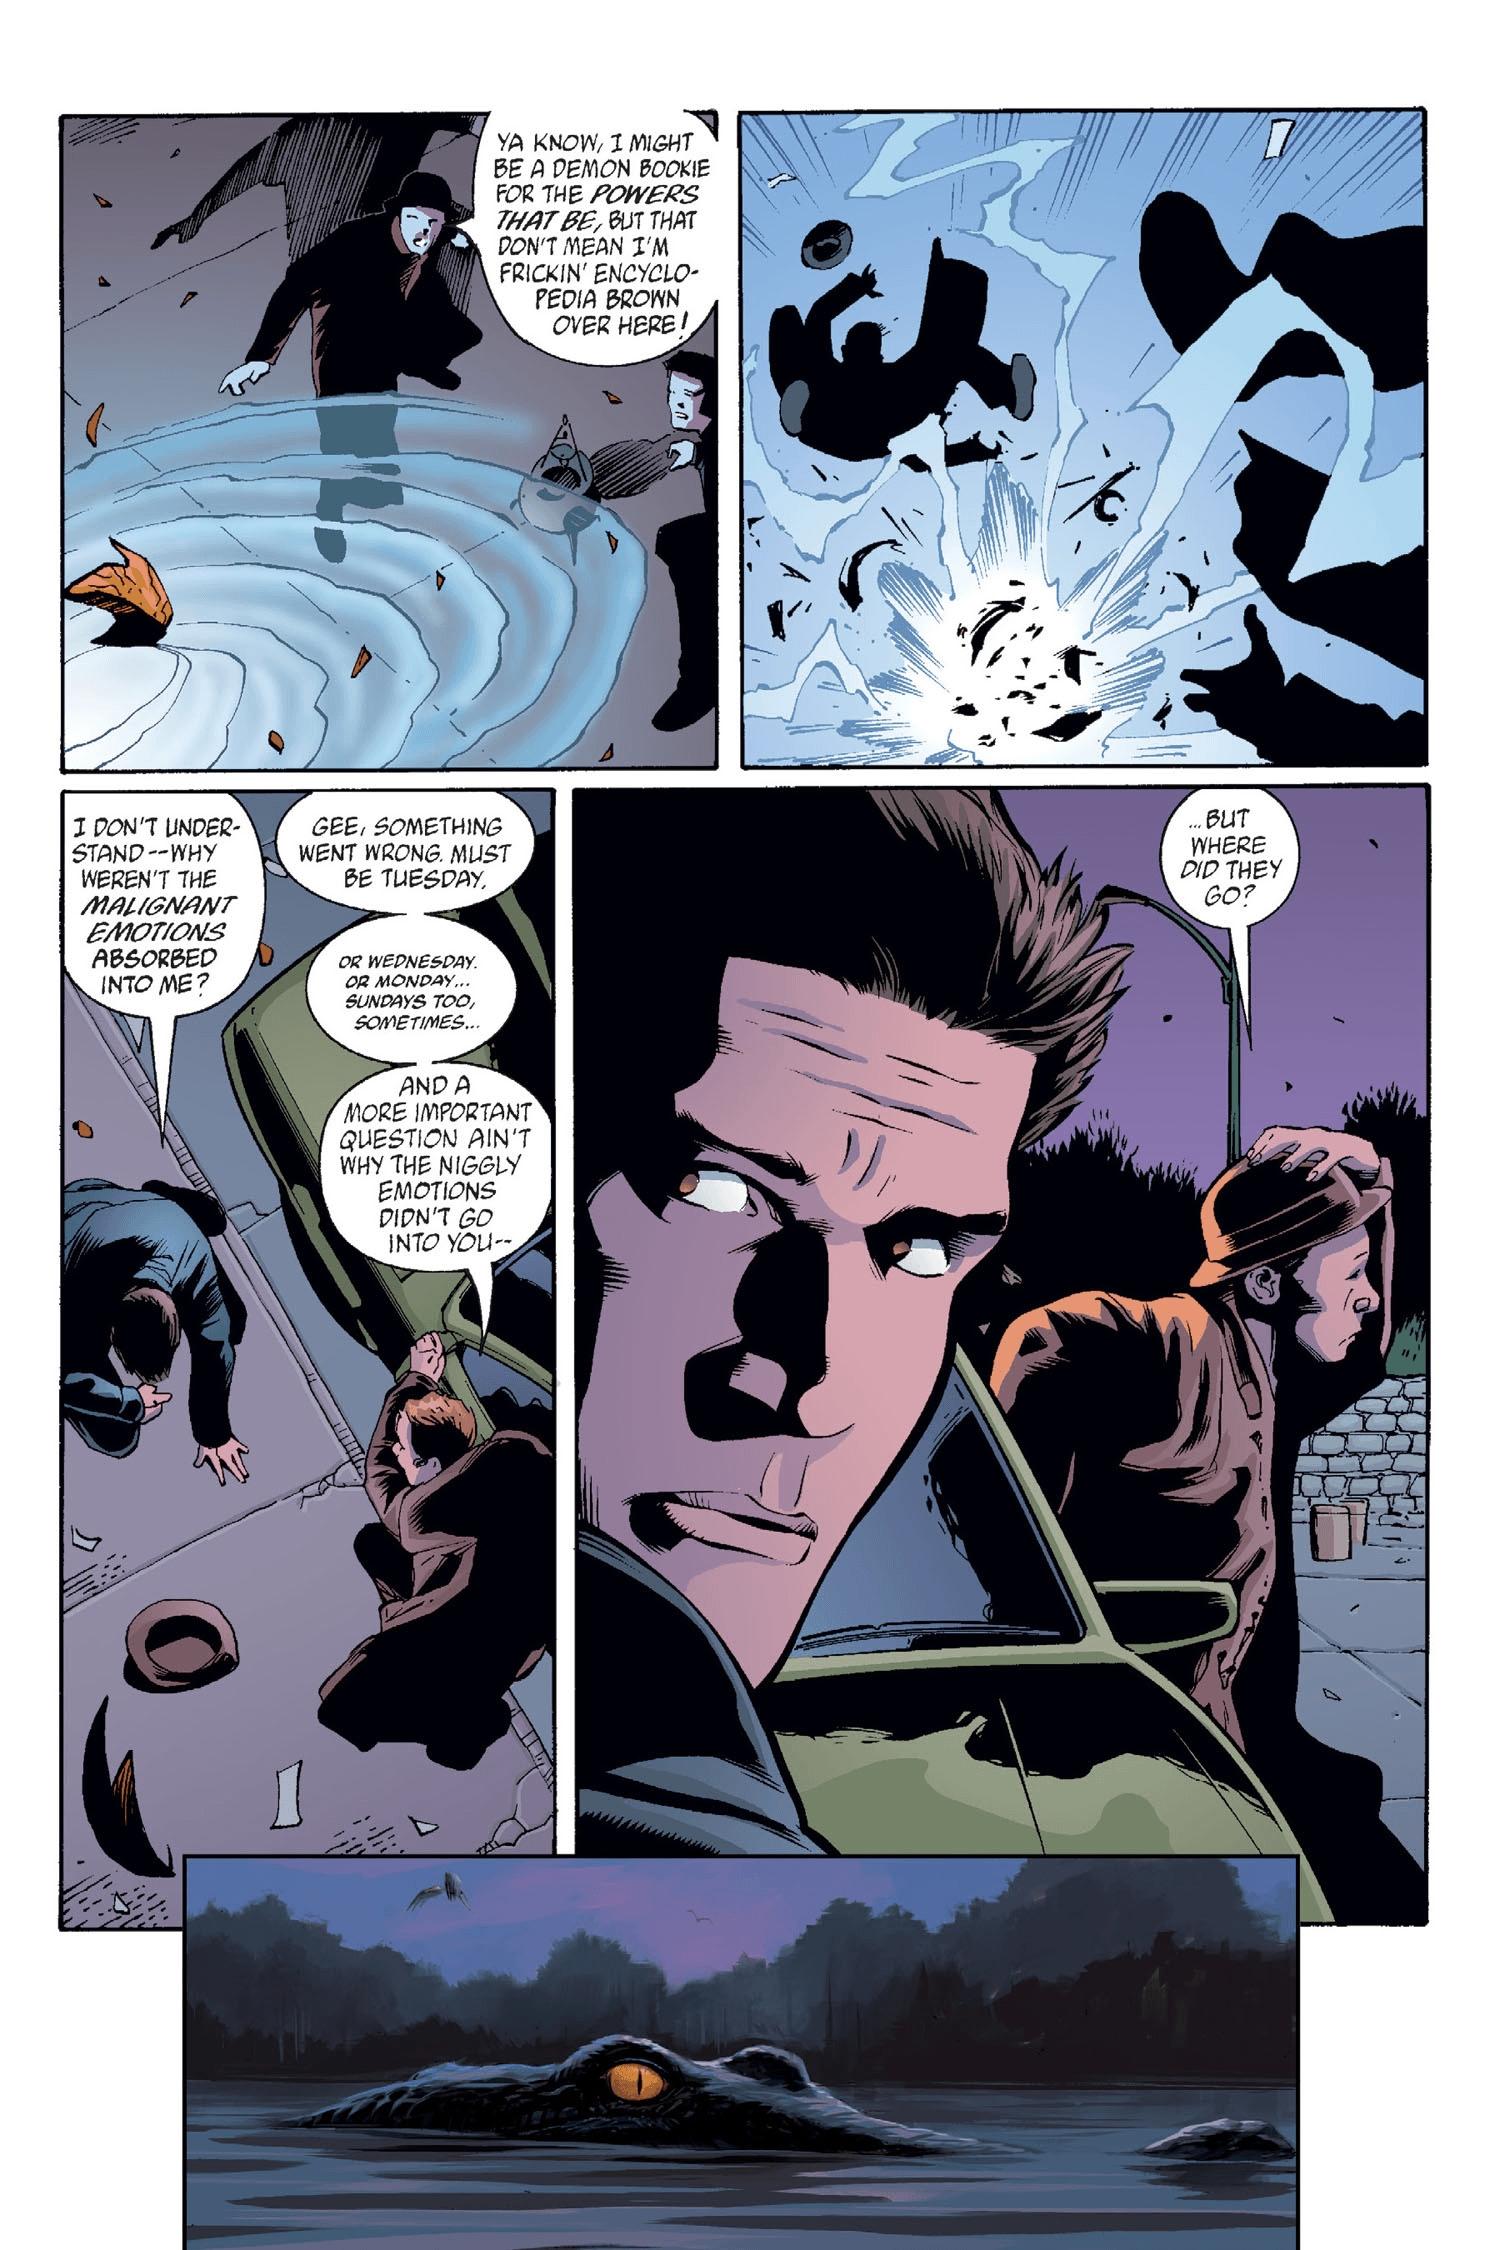 Read online Buffy the Vampire Slayer: Omnibus comic -  Issue # TPB 2 - 29